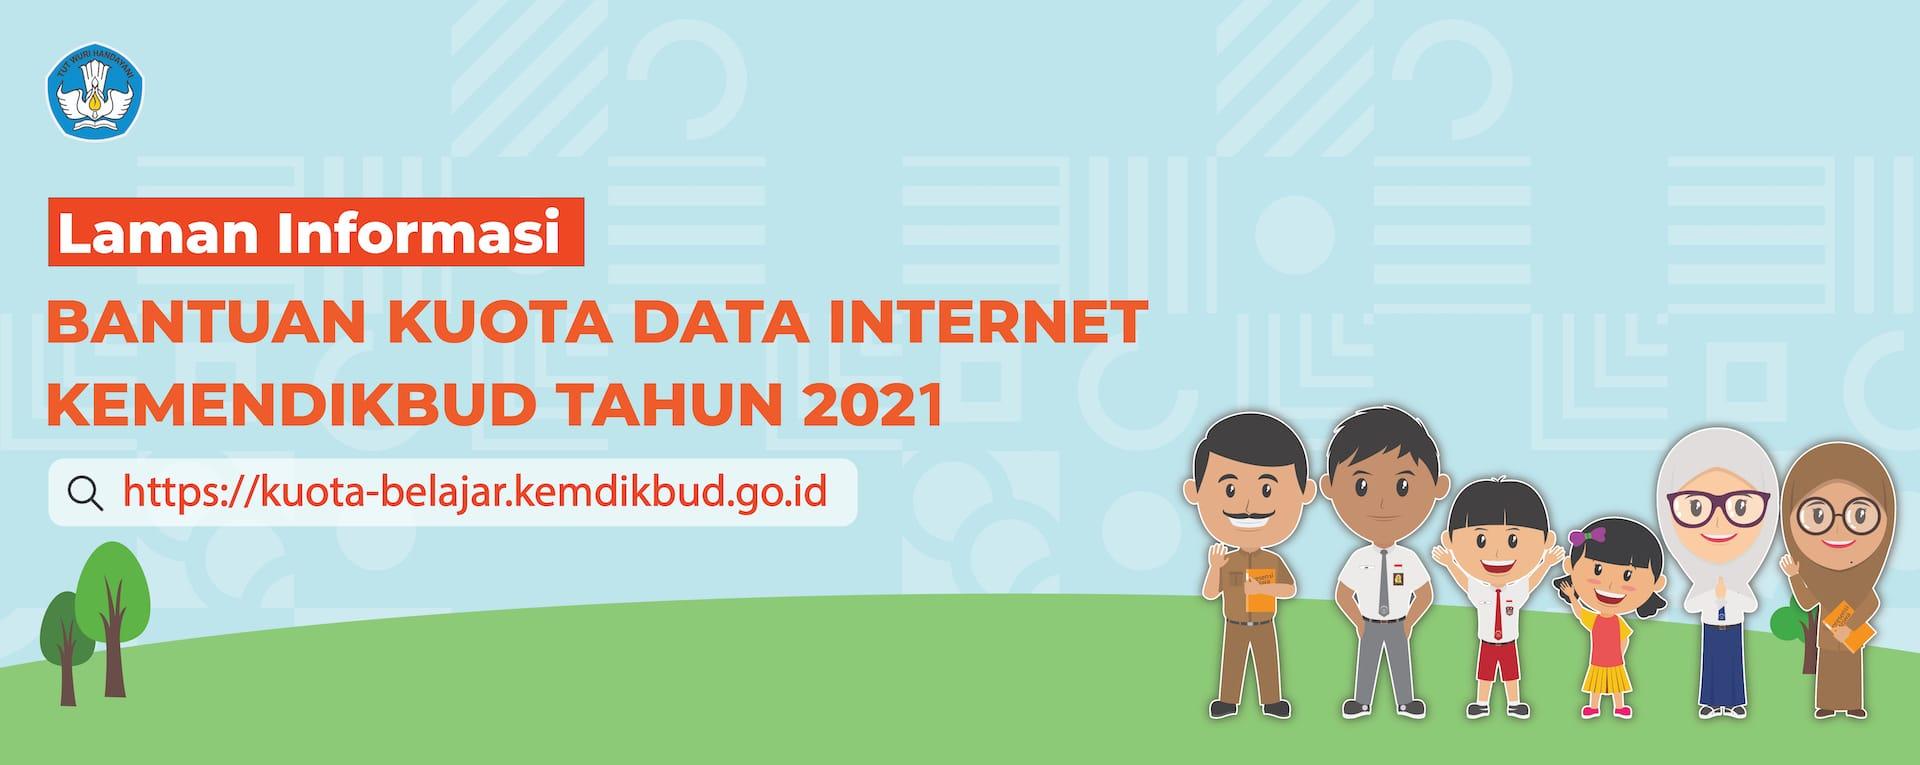 Bantuan Kuota Belajar Kemendikbud 2021